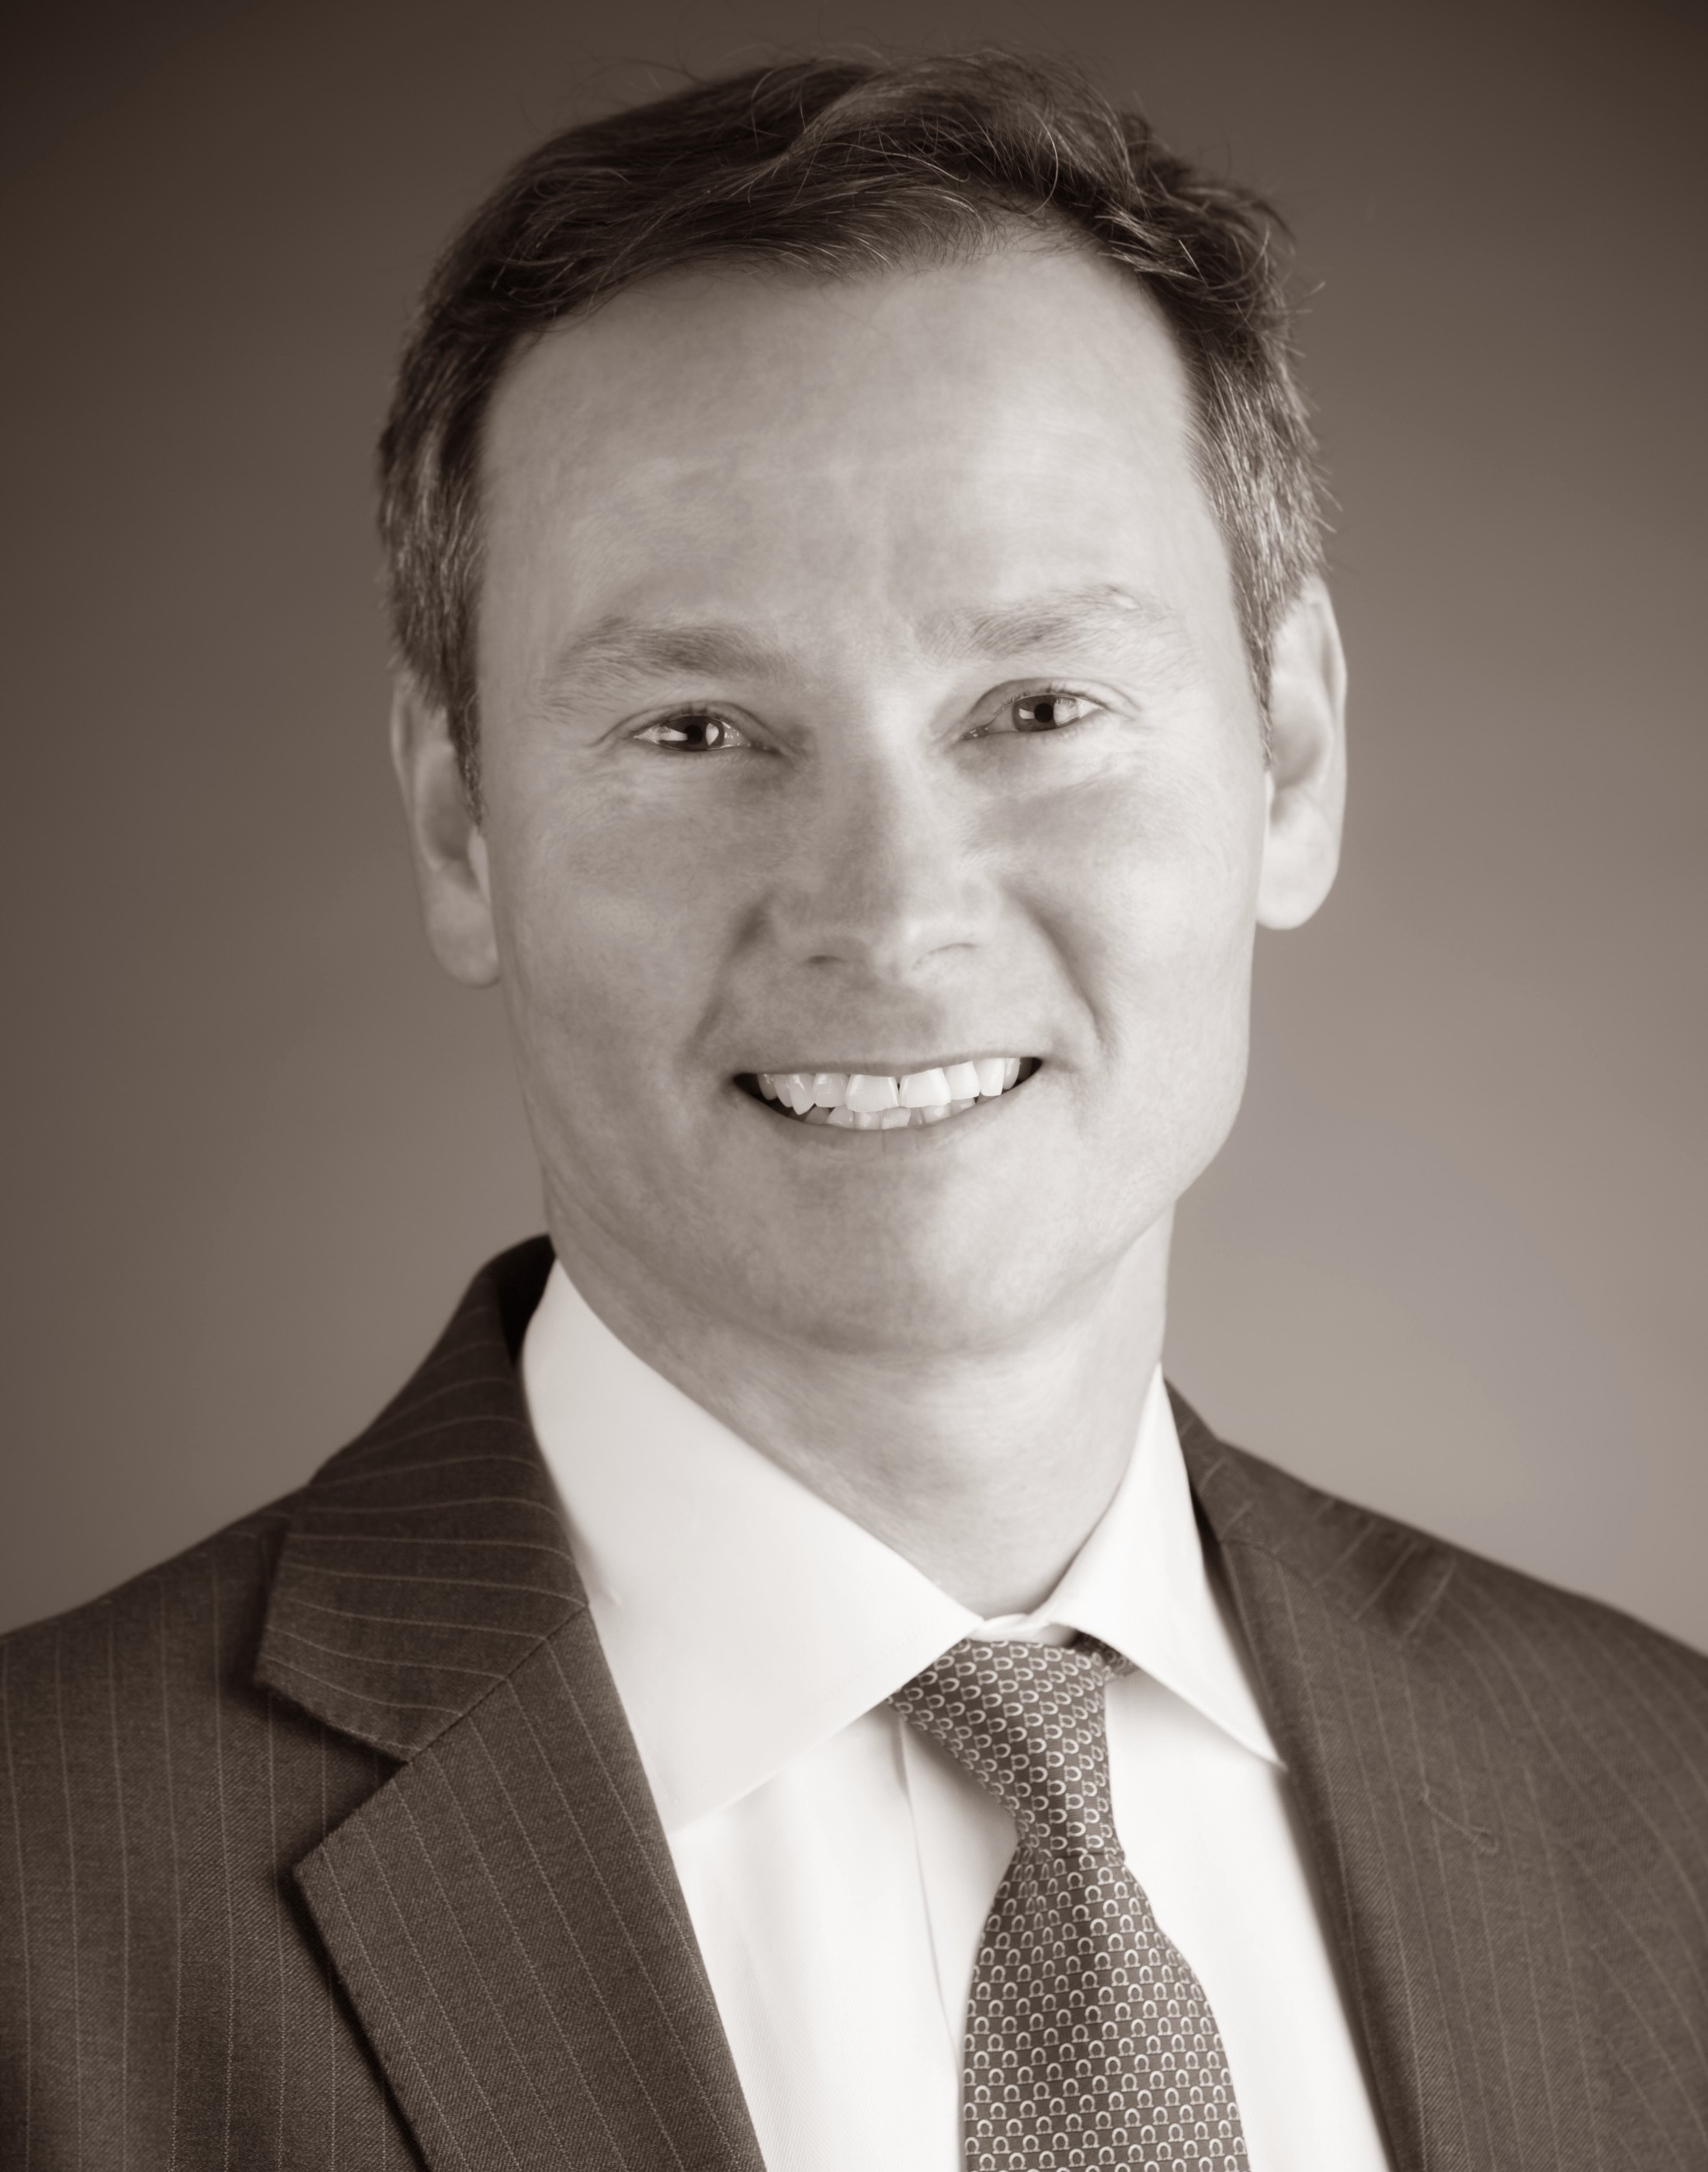 Michael Rankin